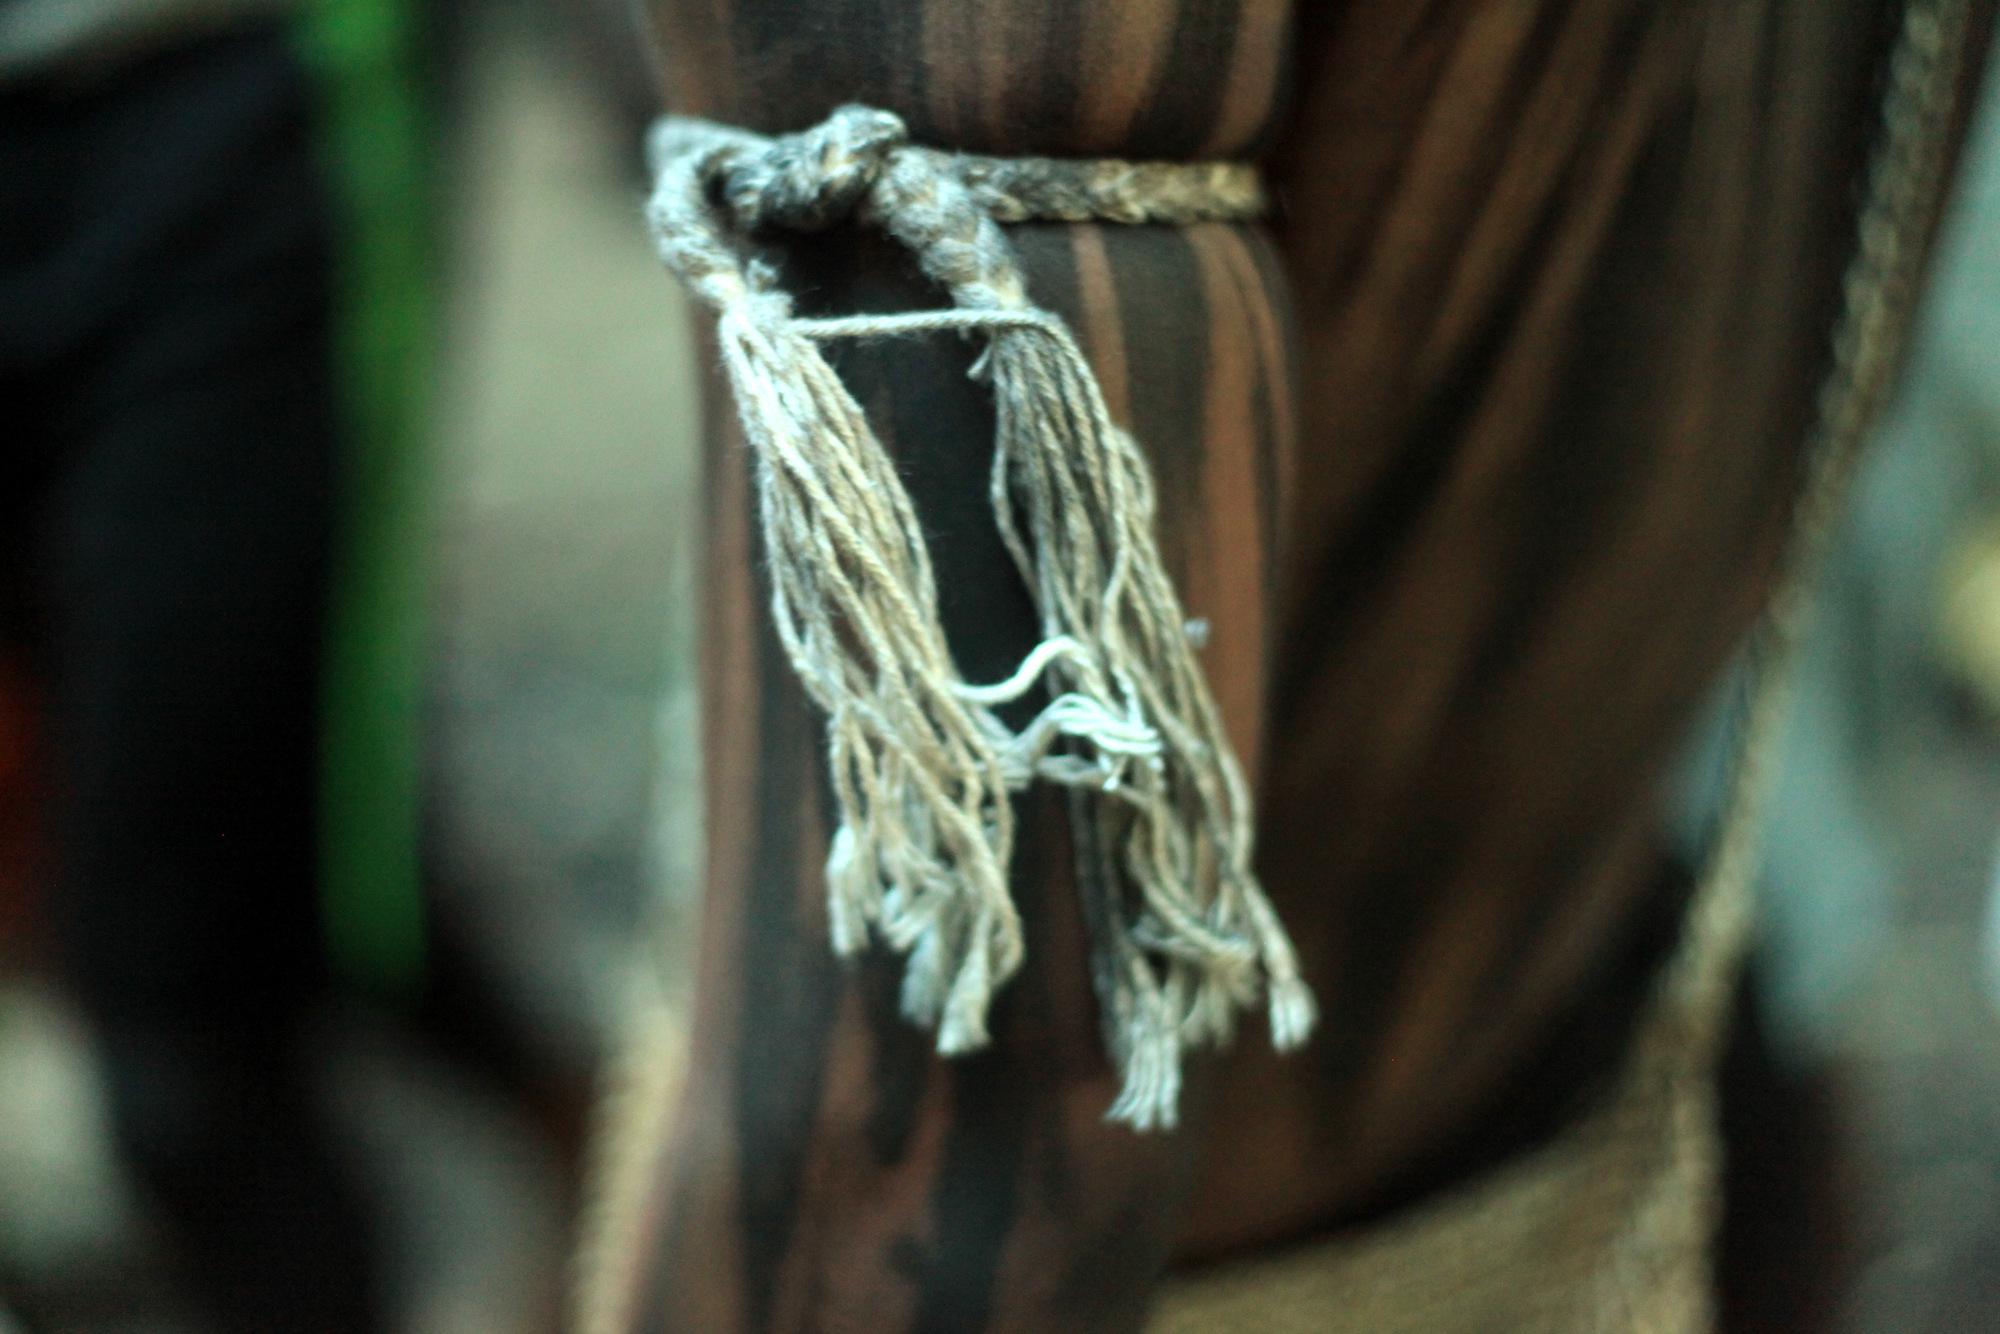 Ritual relizado pelos índios Fulni-ô